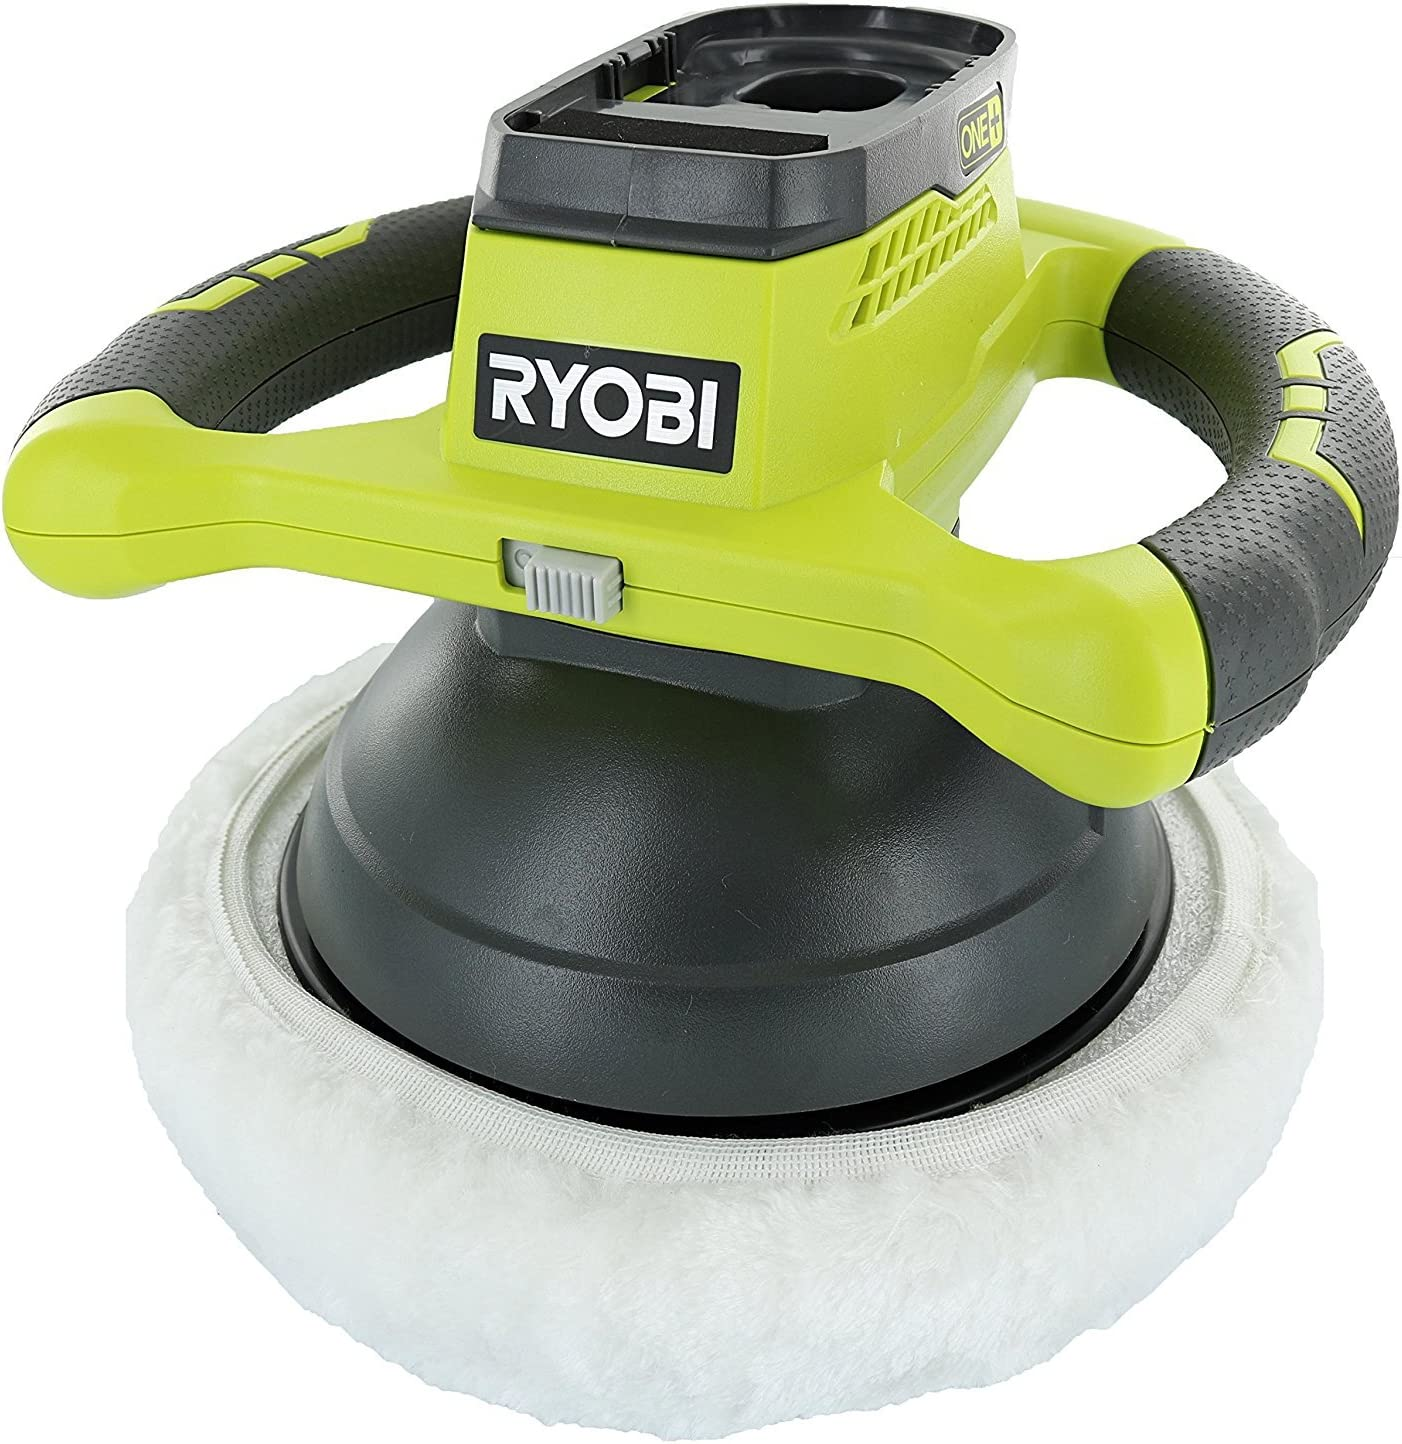 Ryobi P435 One + 2500 RPM Cordless Orbital Buffer